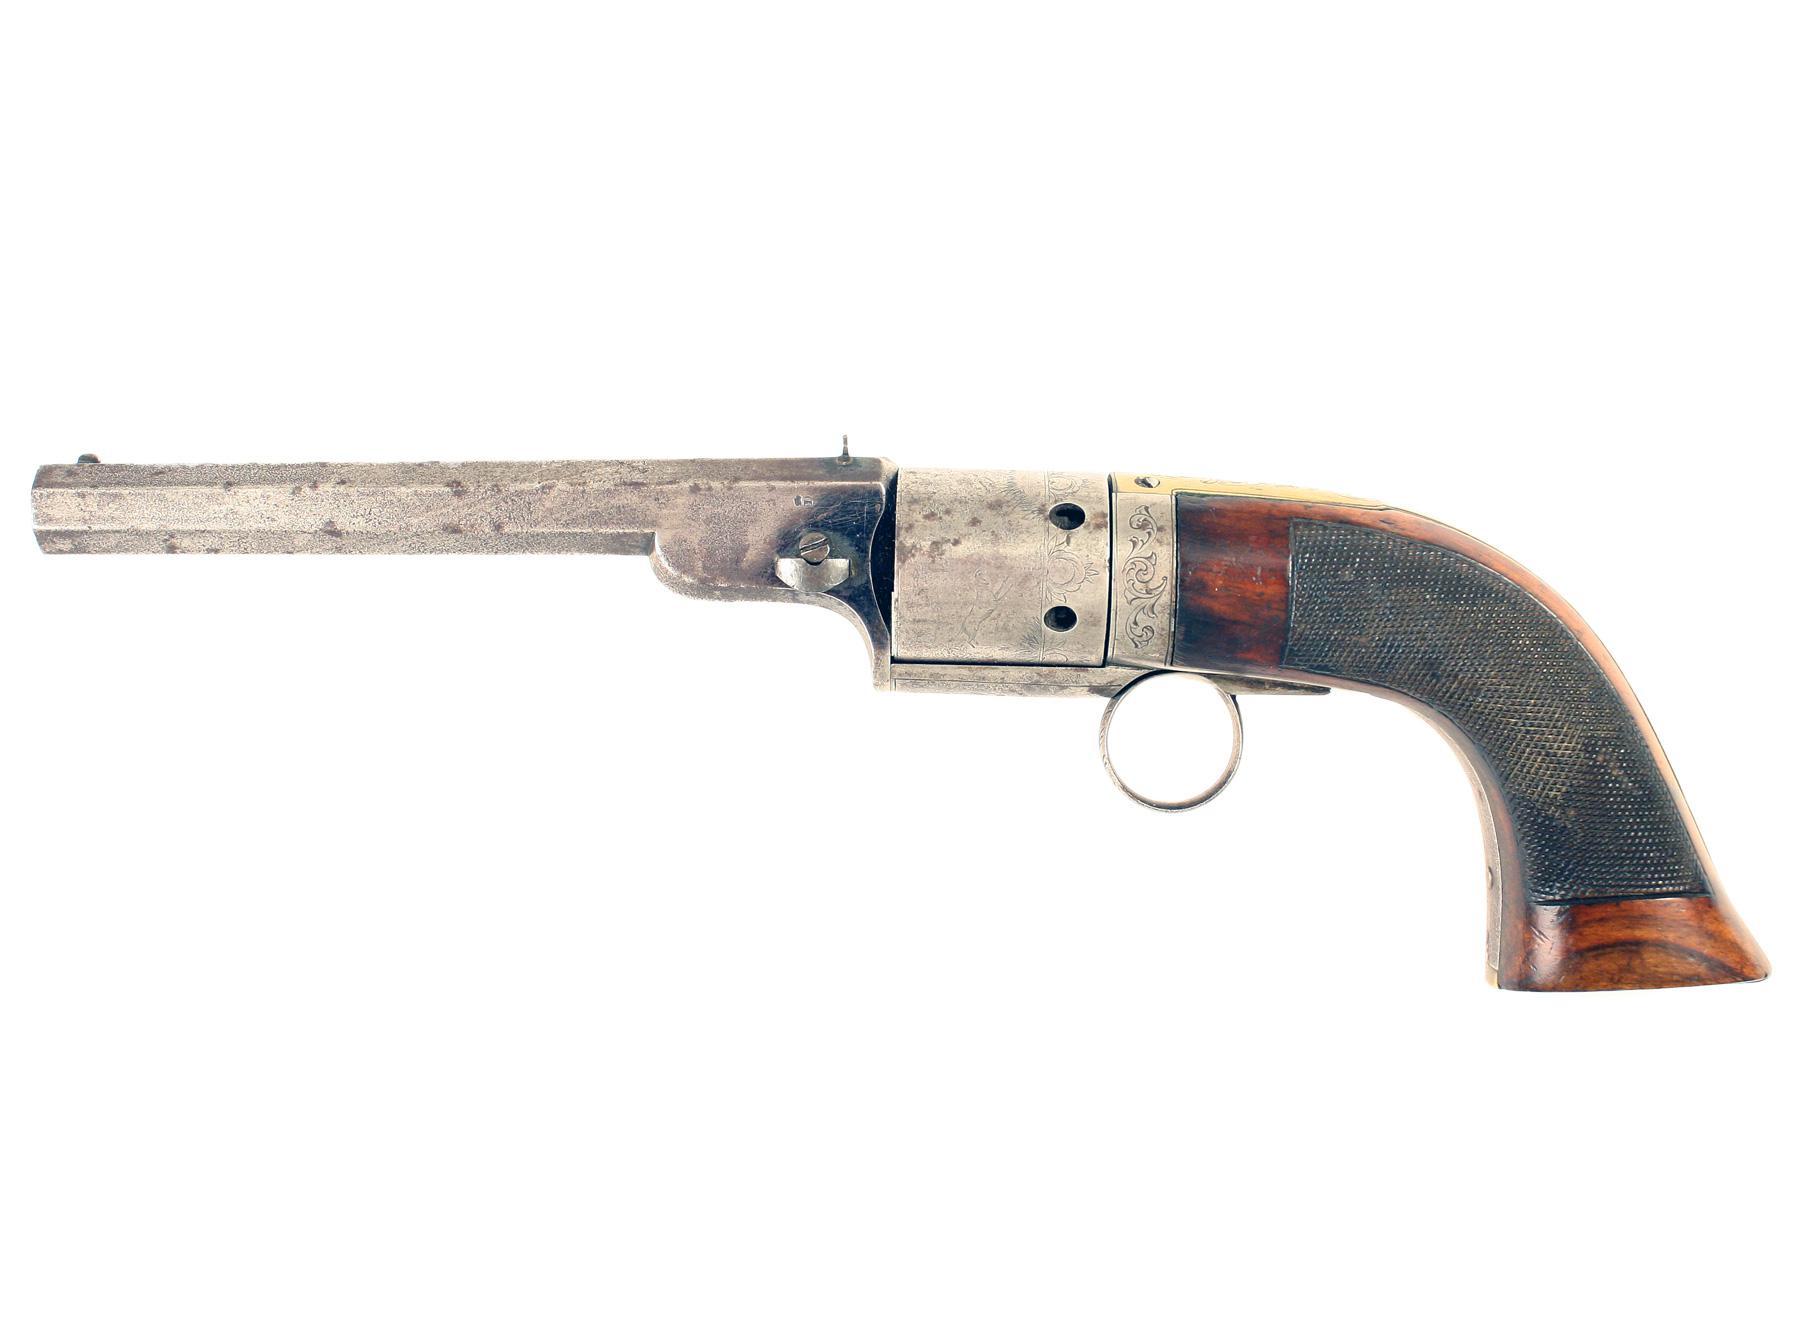 A Transitional Revolver ex. Harrod Collection